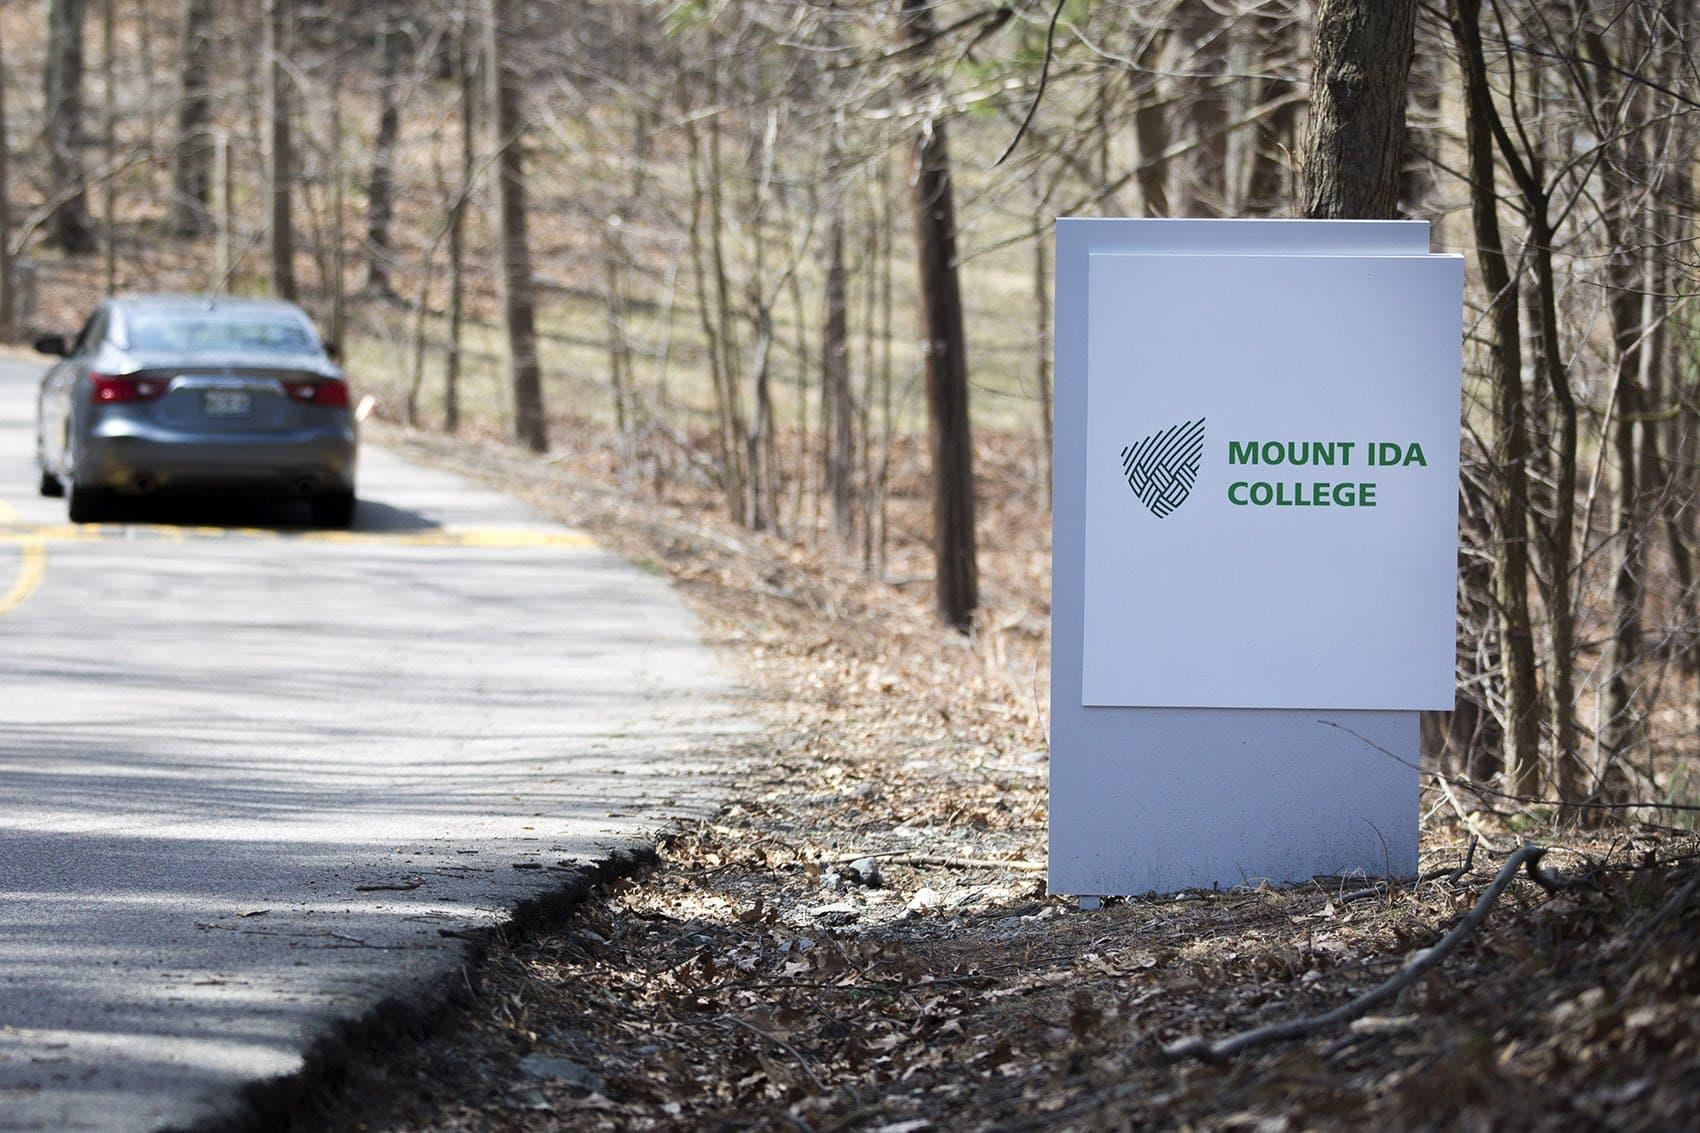 mount ida campus map Federal Judge Dismisses Lawsuit By Former Mount Ida Students Edify mount ida campus map